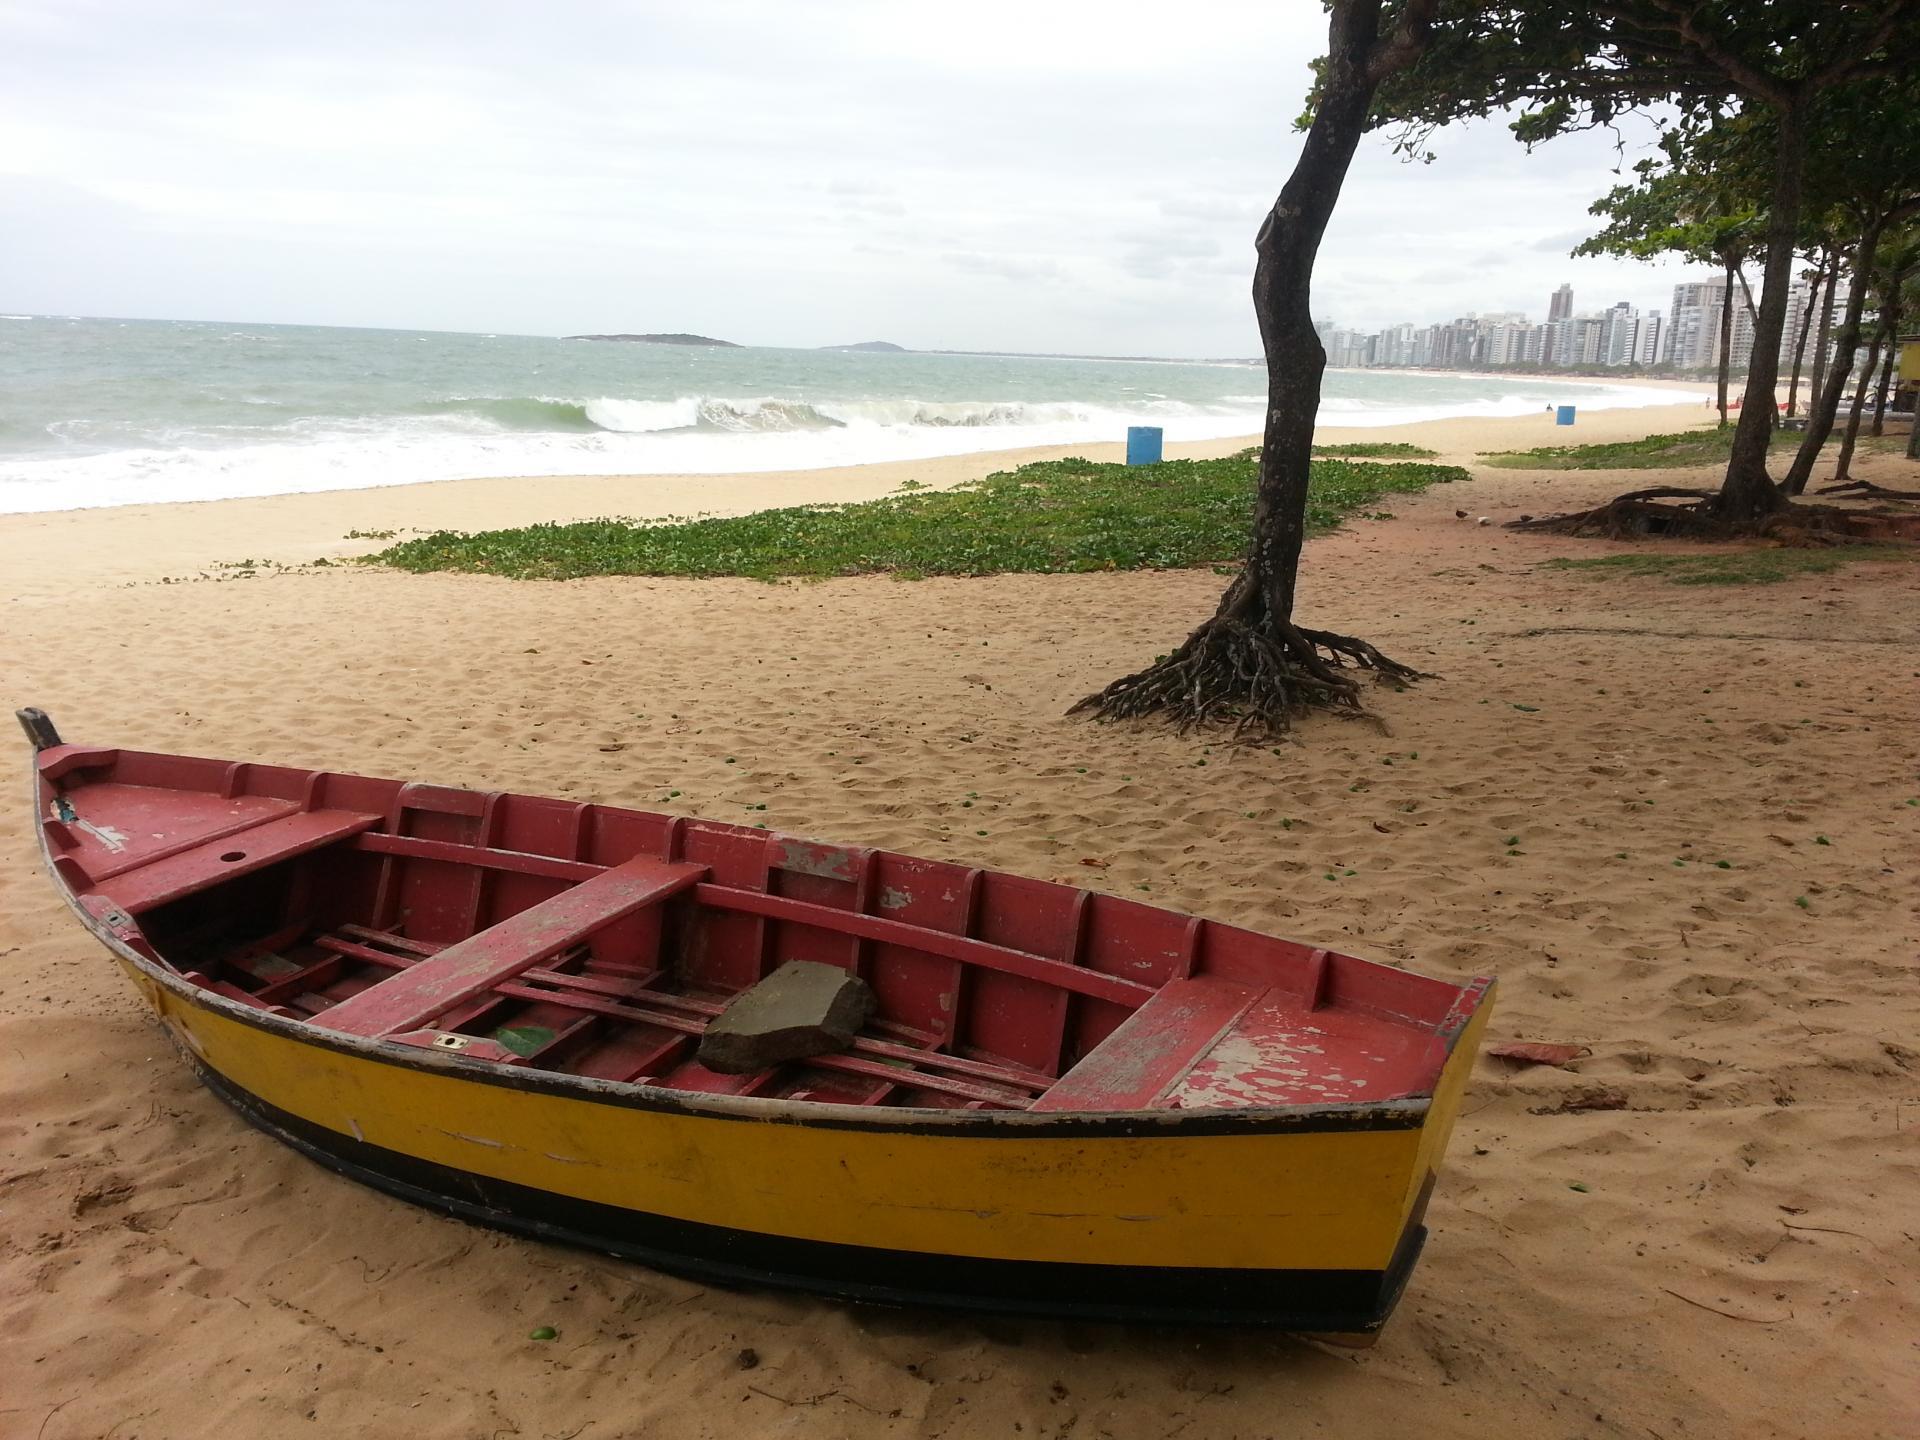 Boat on the beach of Vitoria